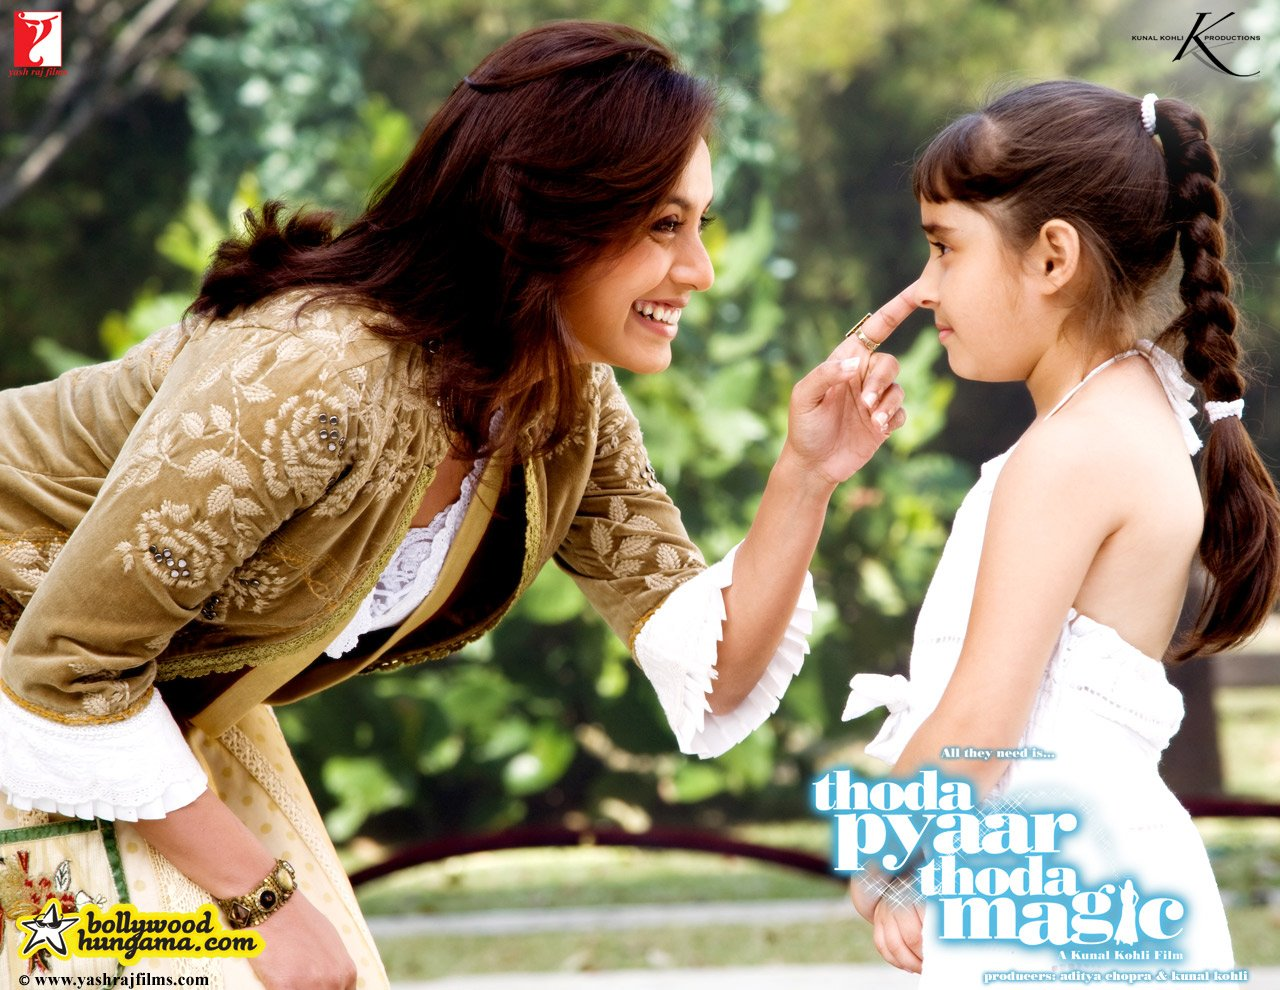 http://i.indiafm.com/posters/movies/08/thodapyaarthodamagic/still10.jpg